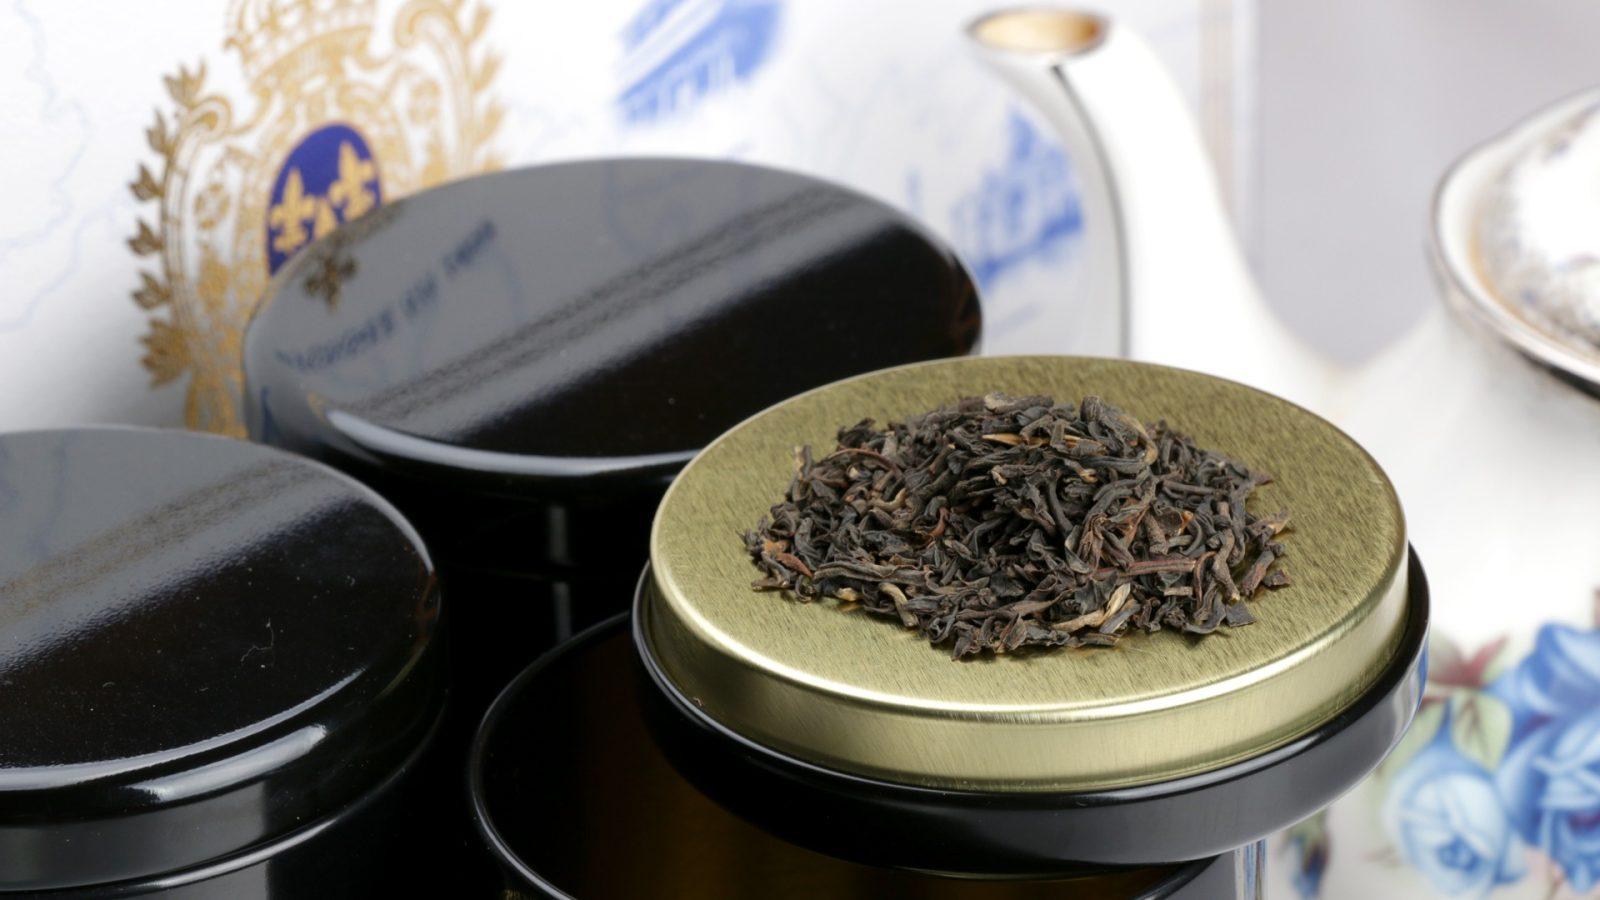 Coffret : assortiment de thés